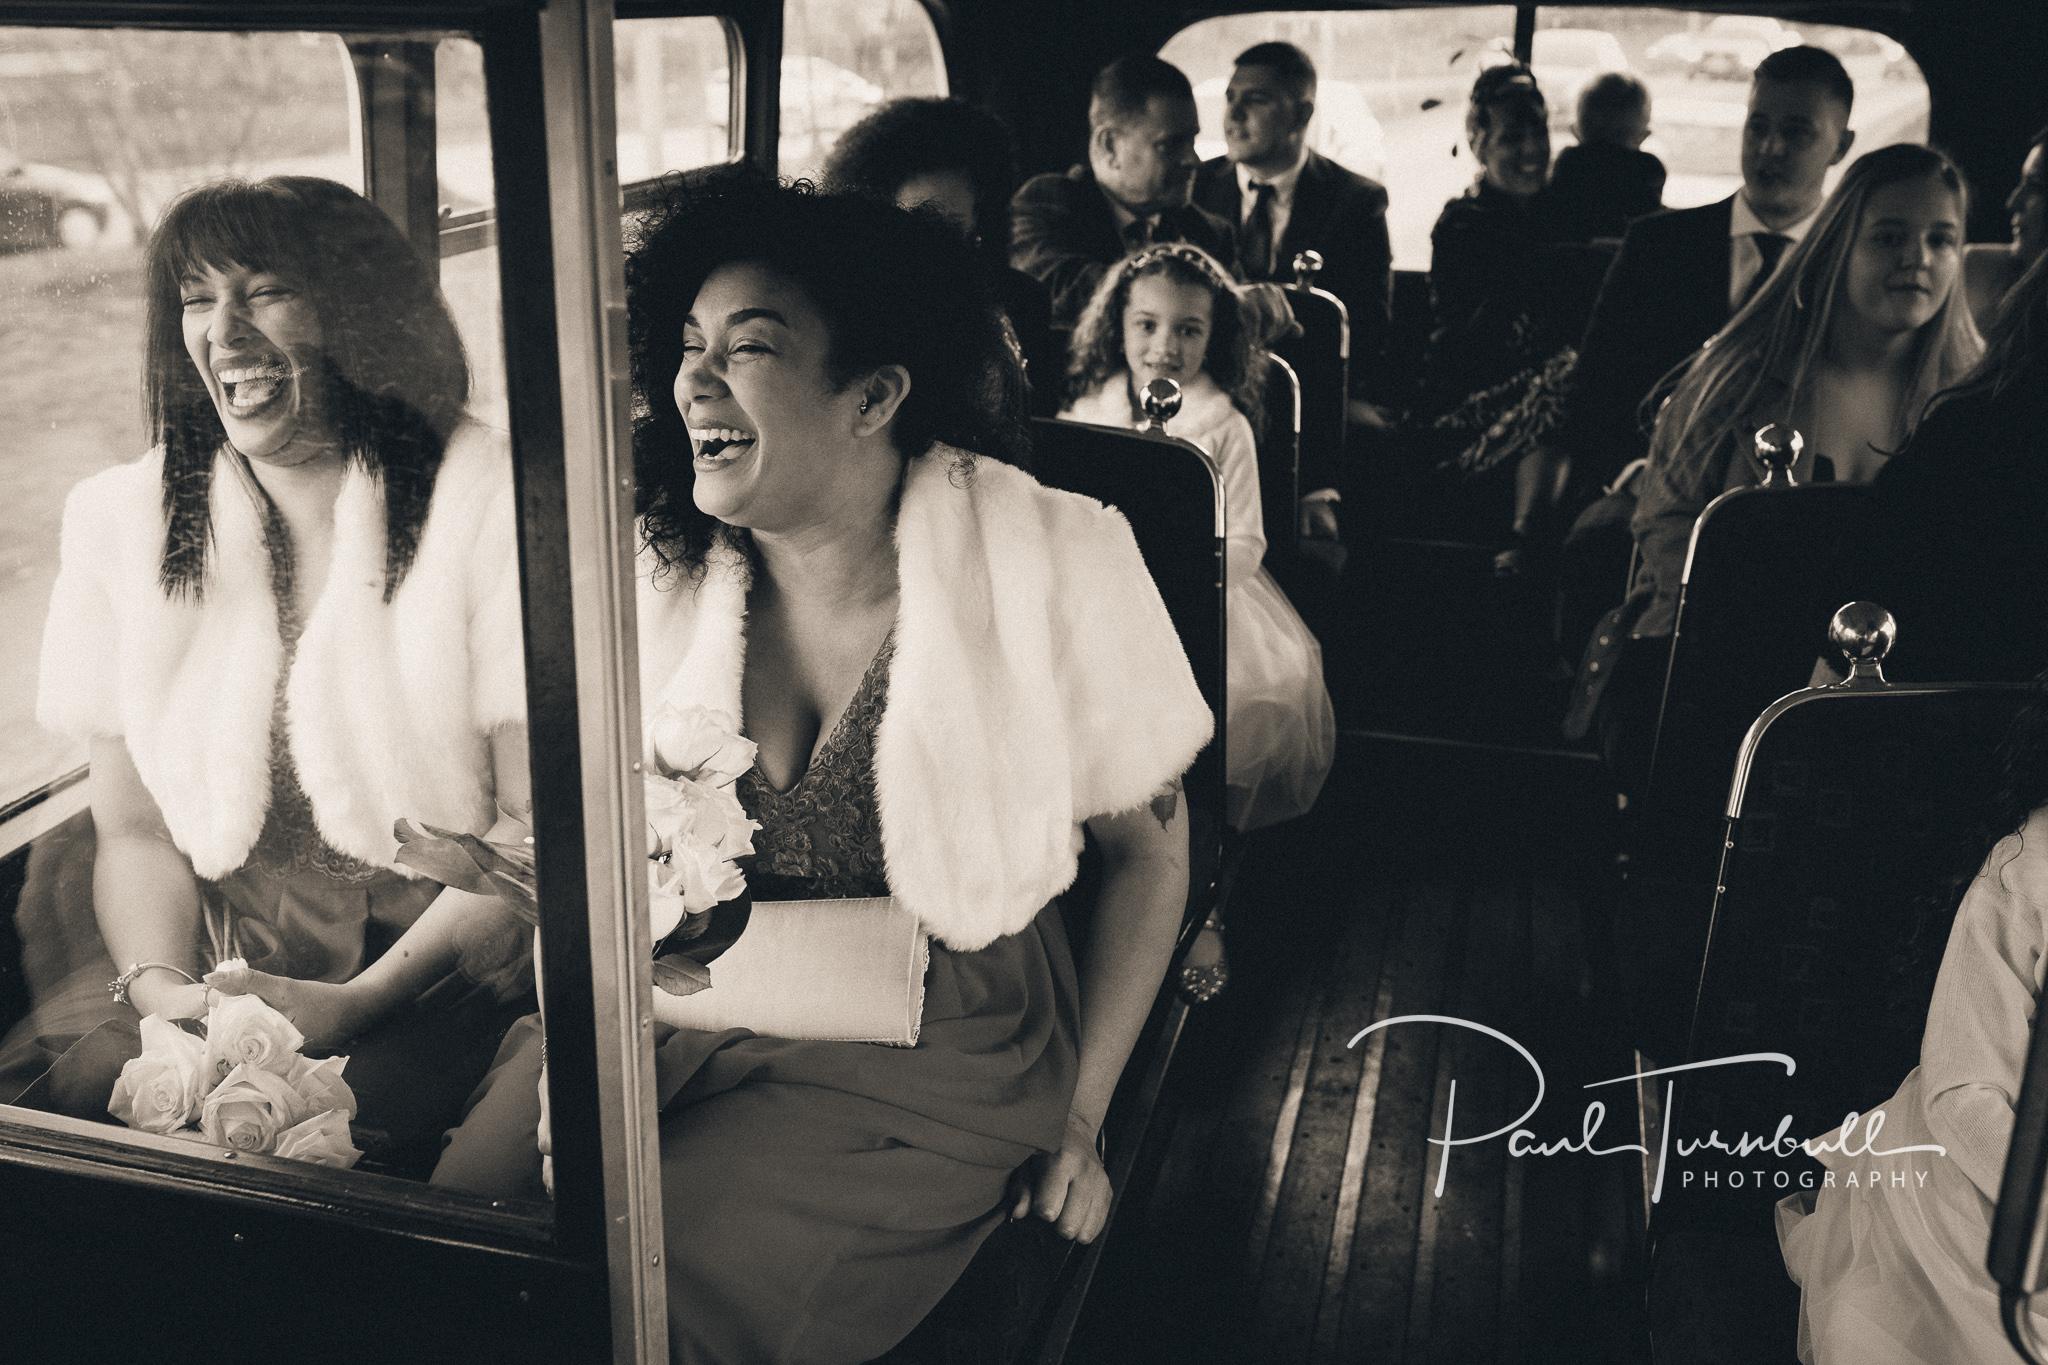 wedding-photographer-leeds-town-hall-009.jpg